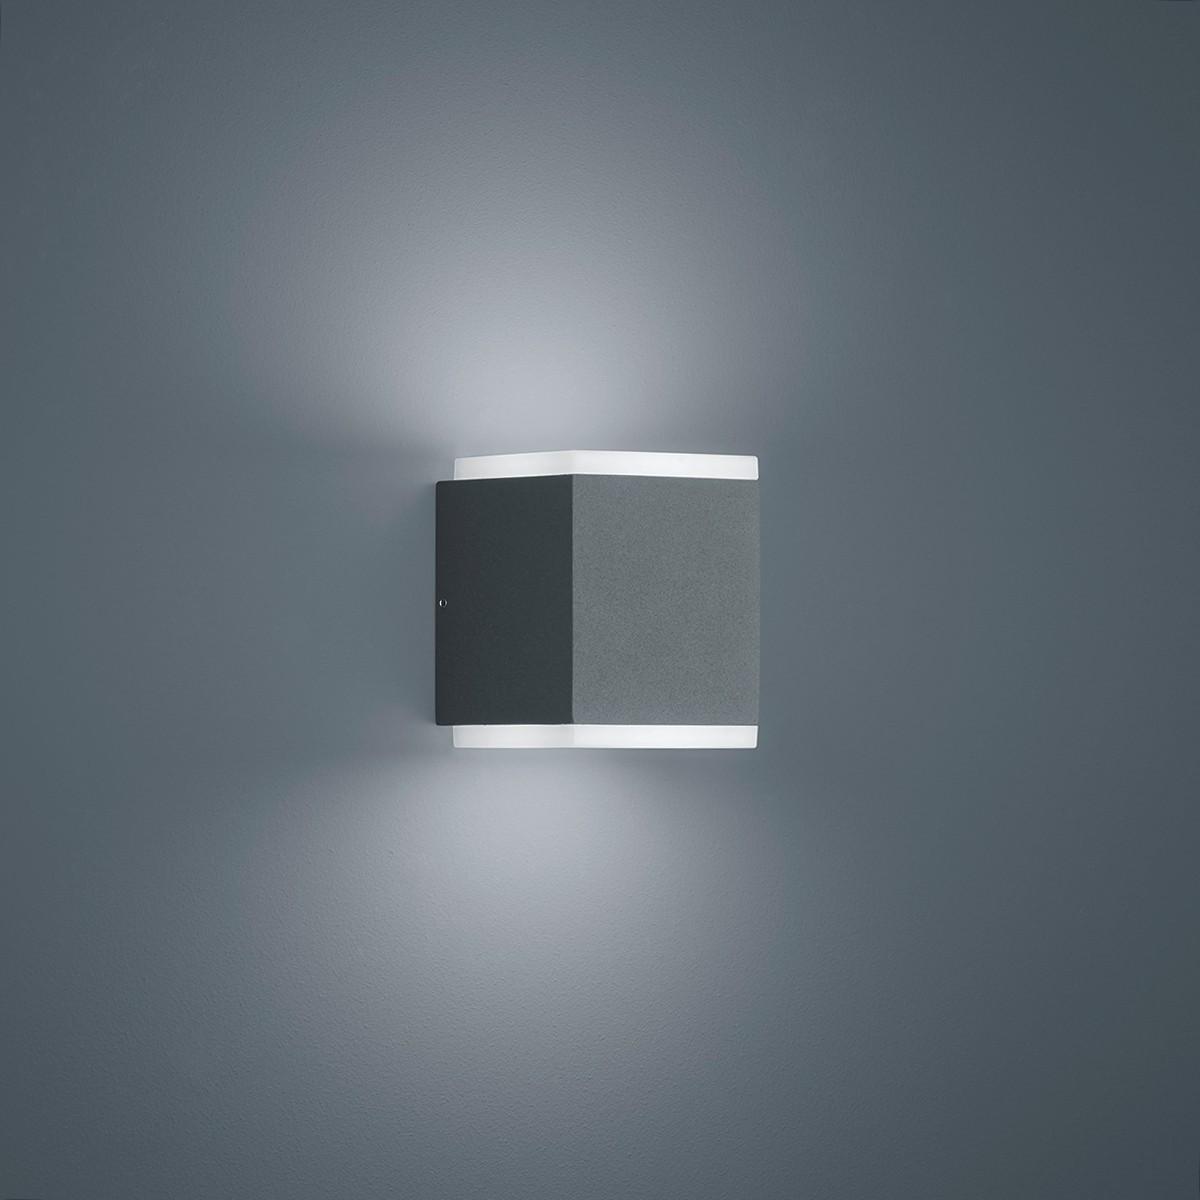 Helestra Kibo LED Außenwandleuchte, graphit